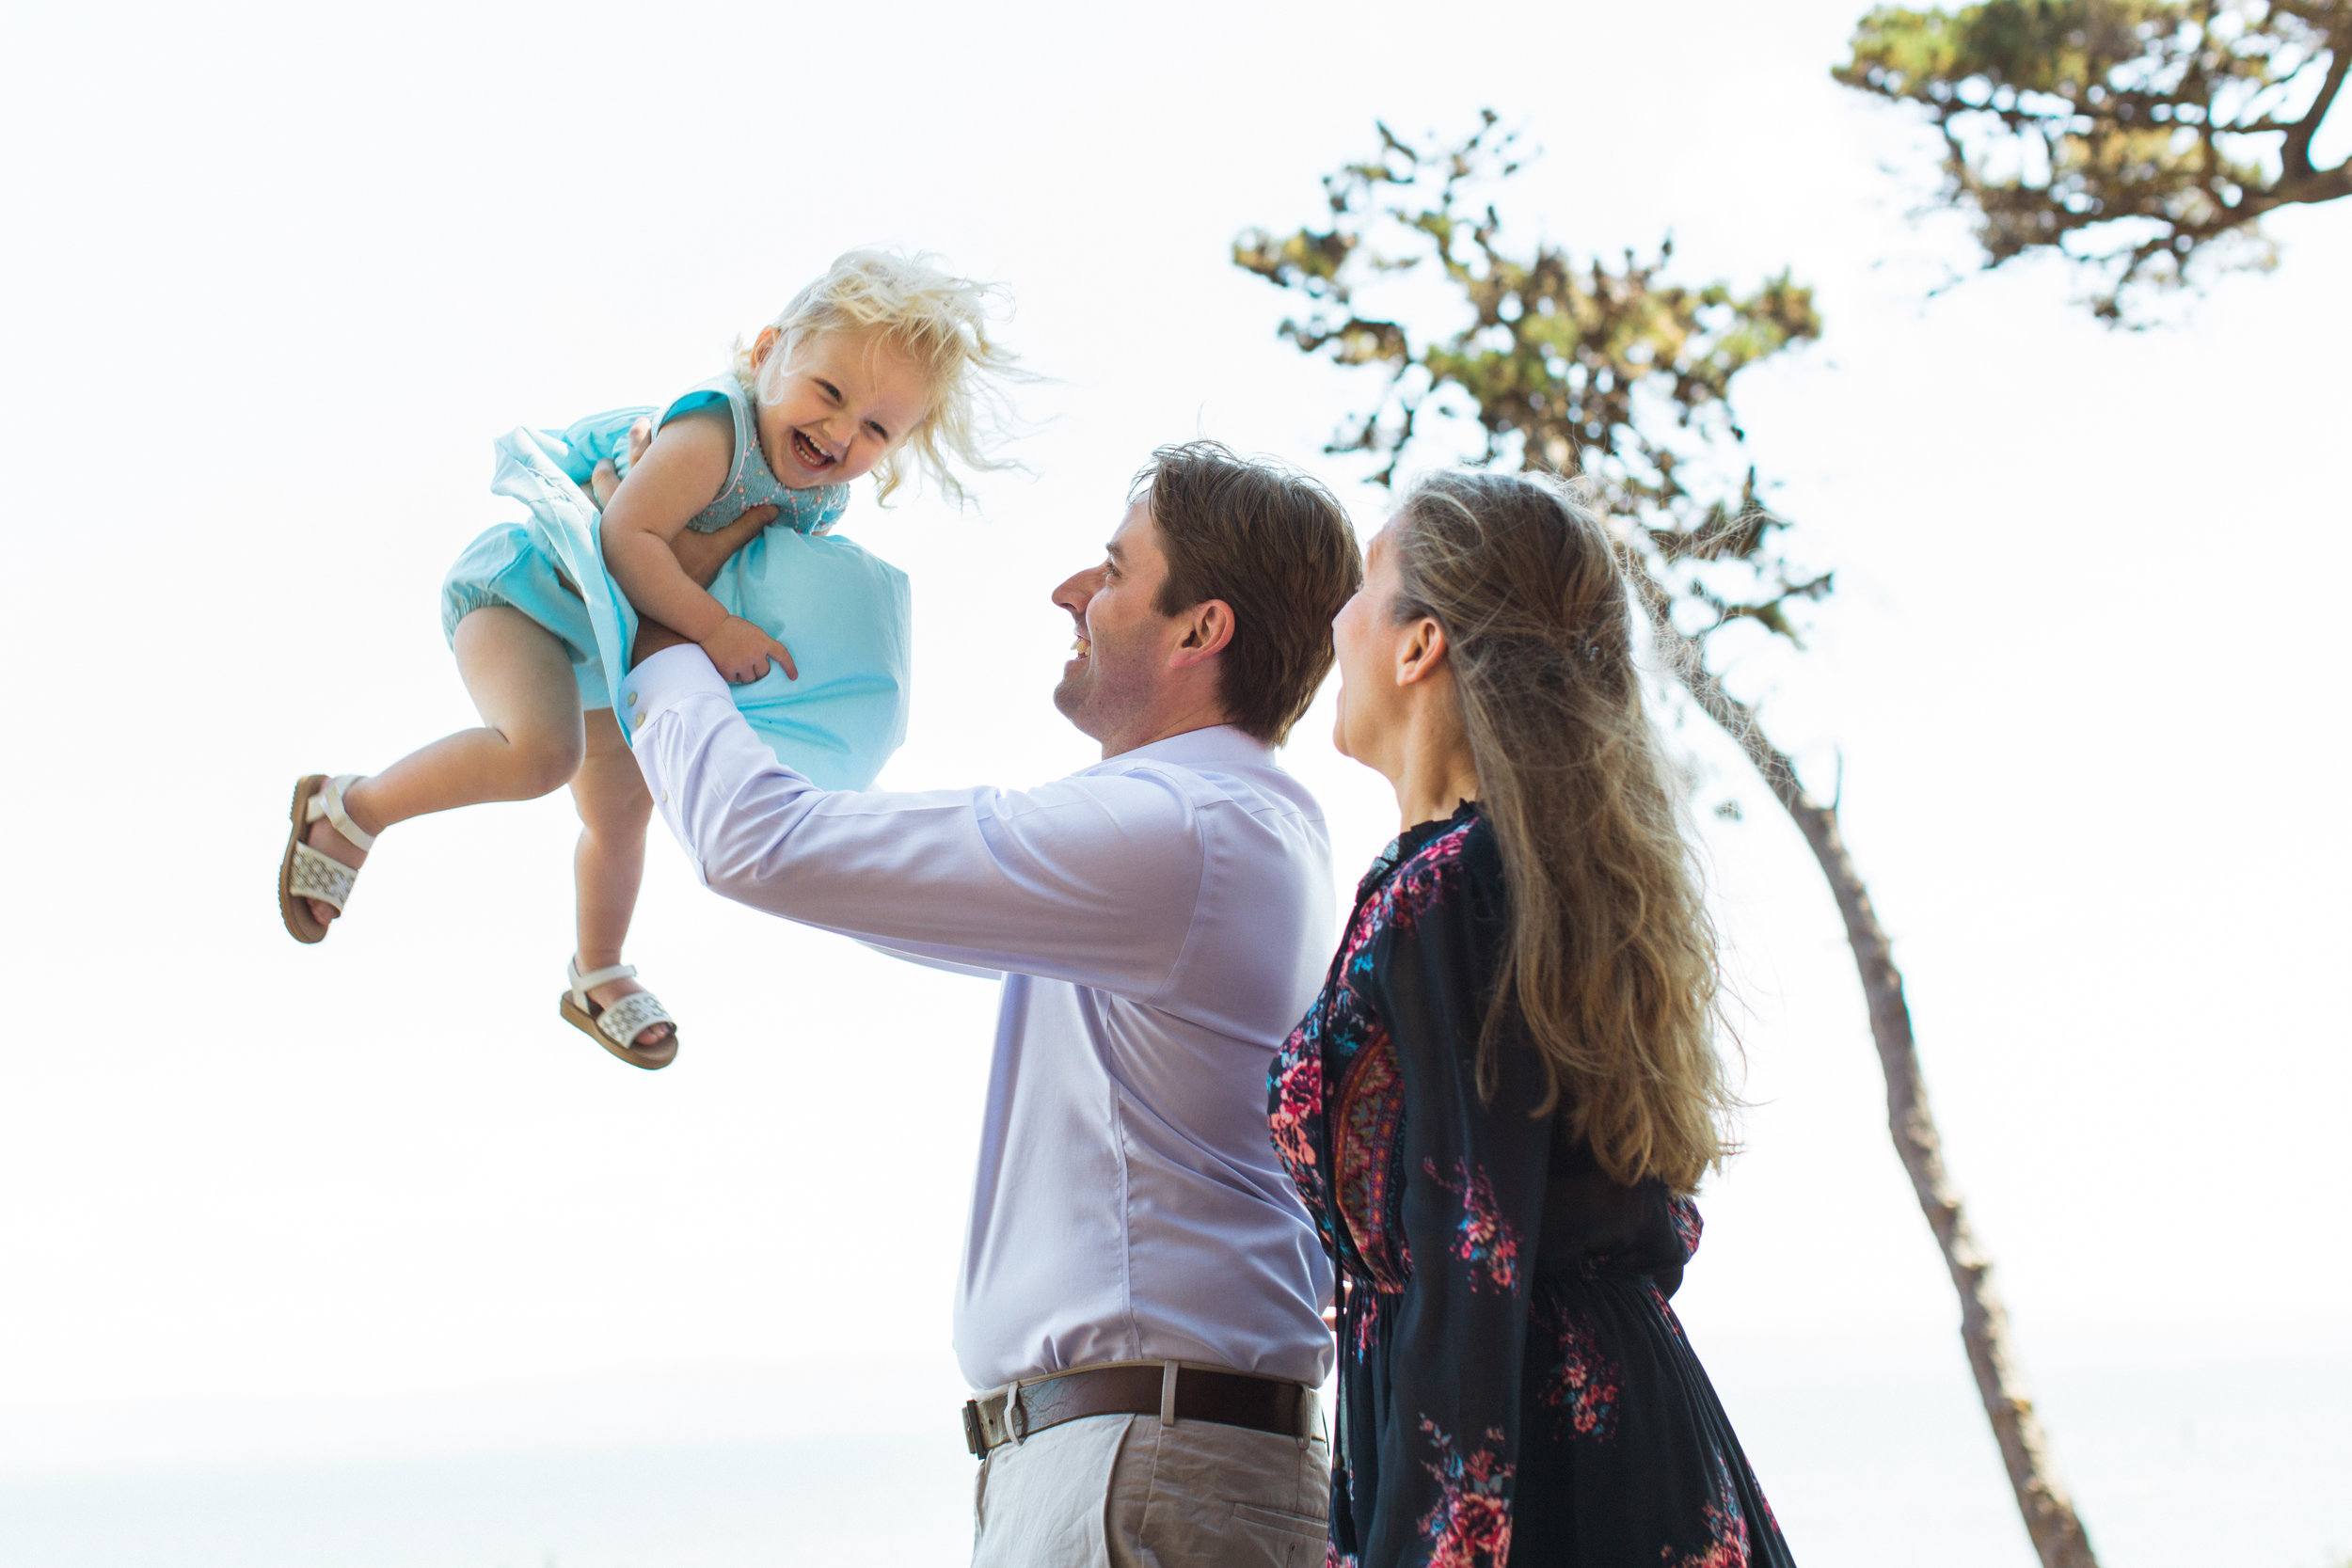 Spelbrink Family - 2018 106.jpg